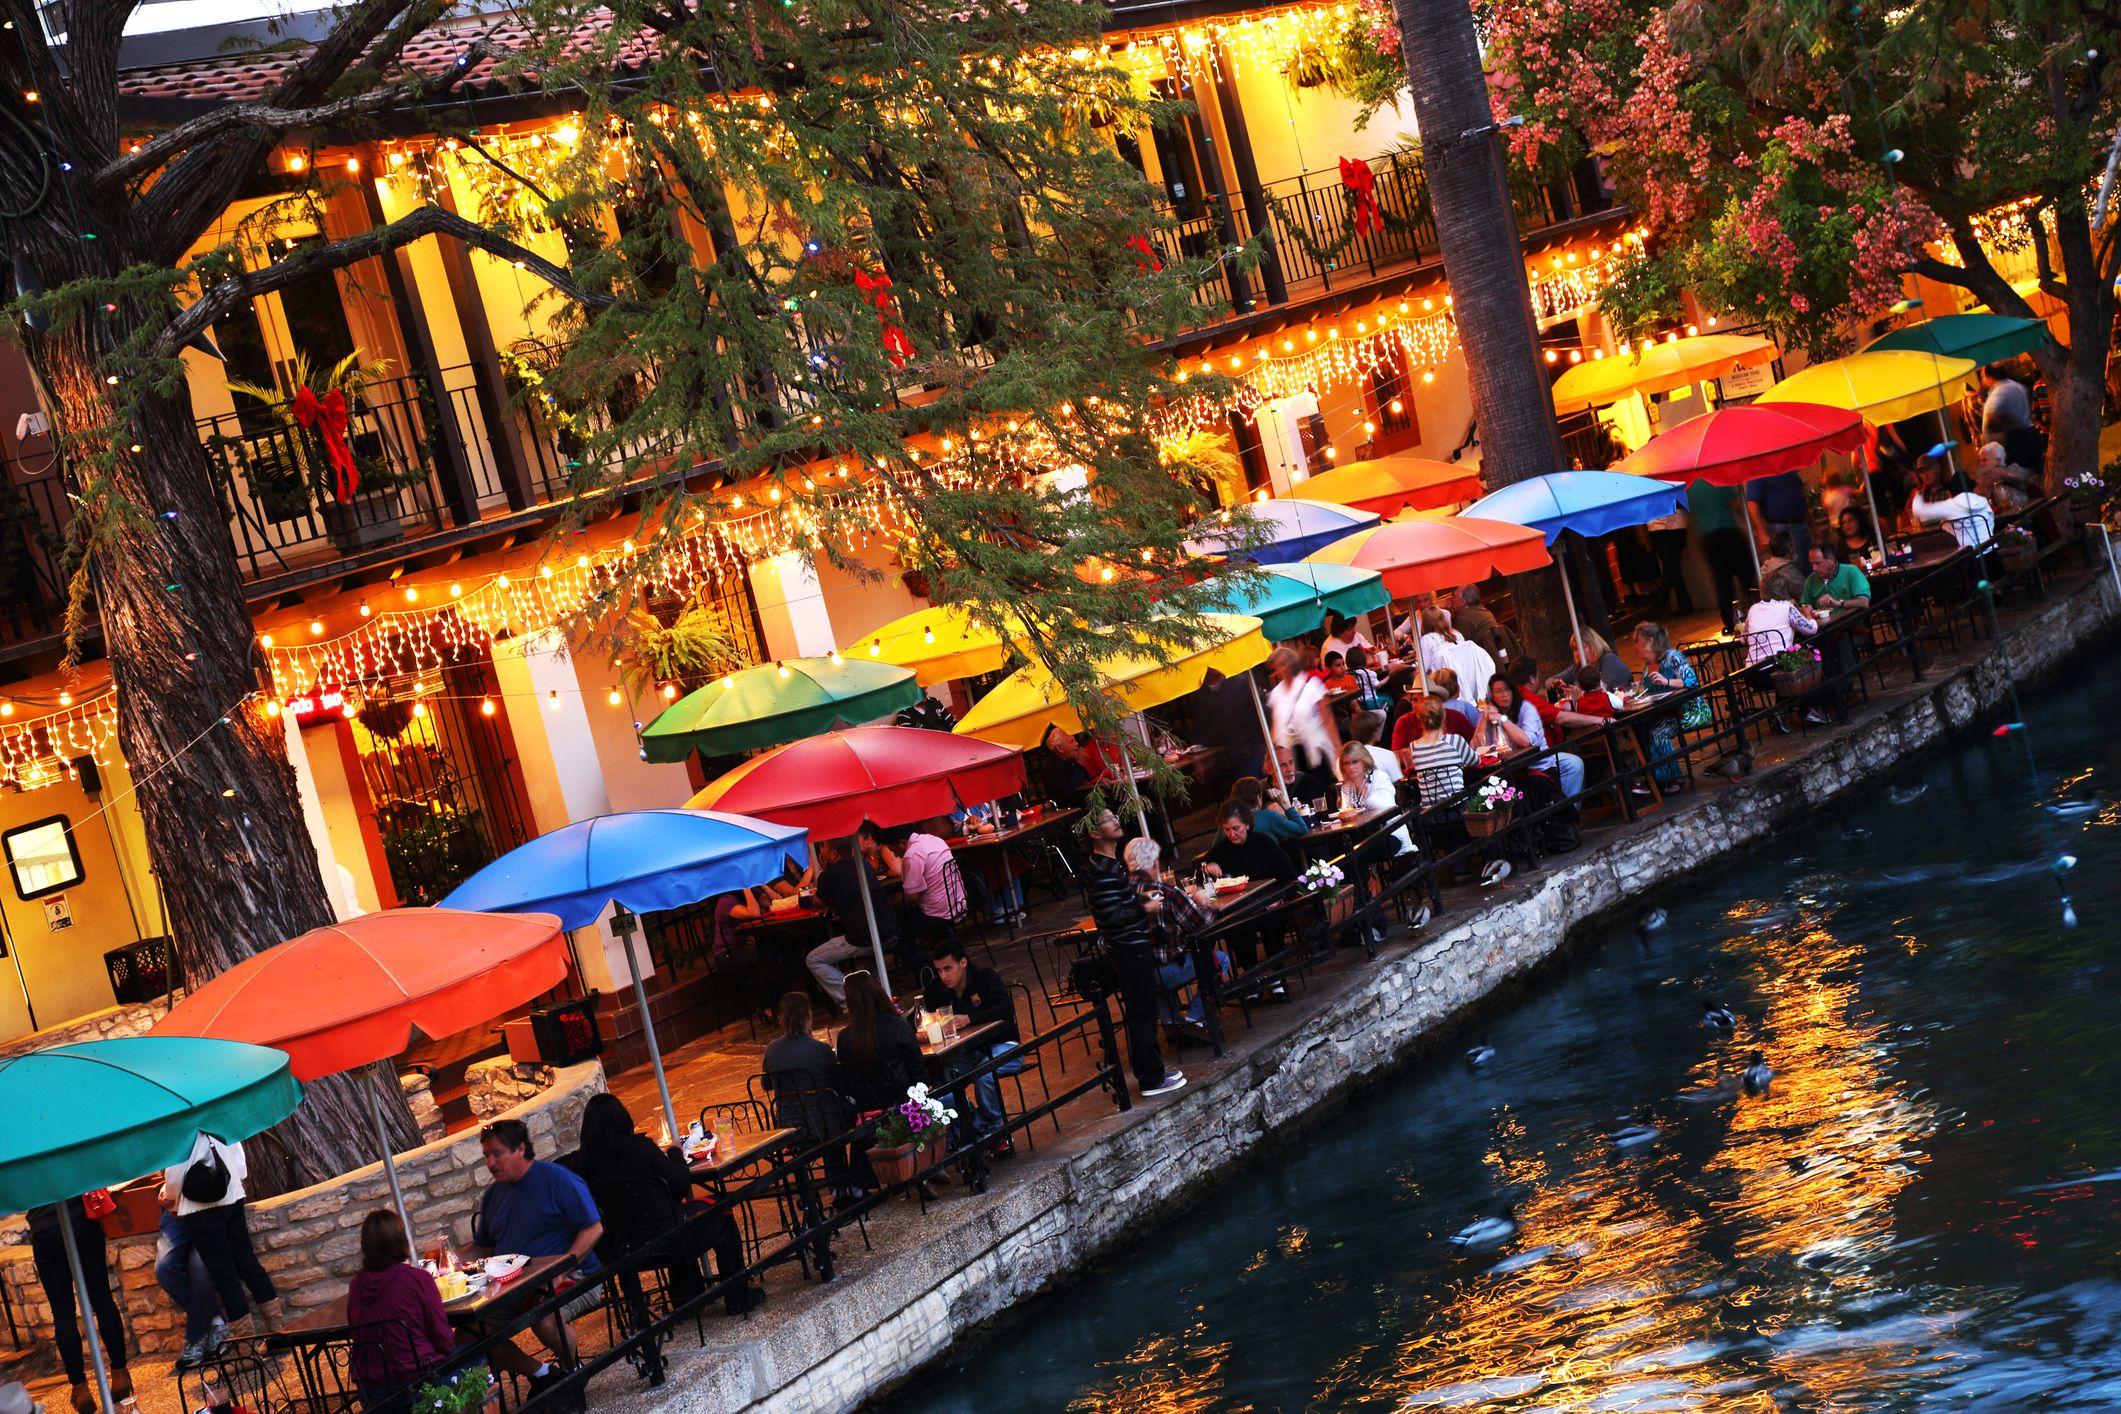 Riverwalk in San Antonio in December